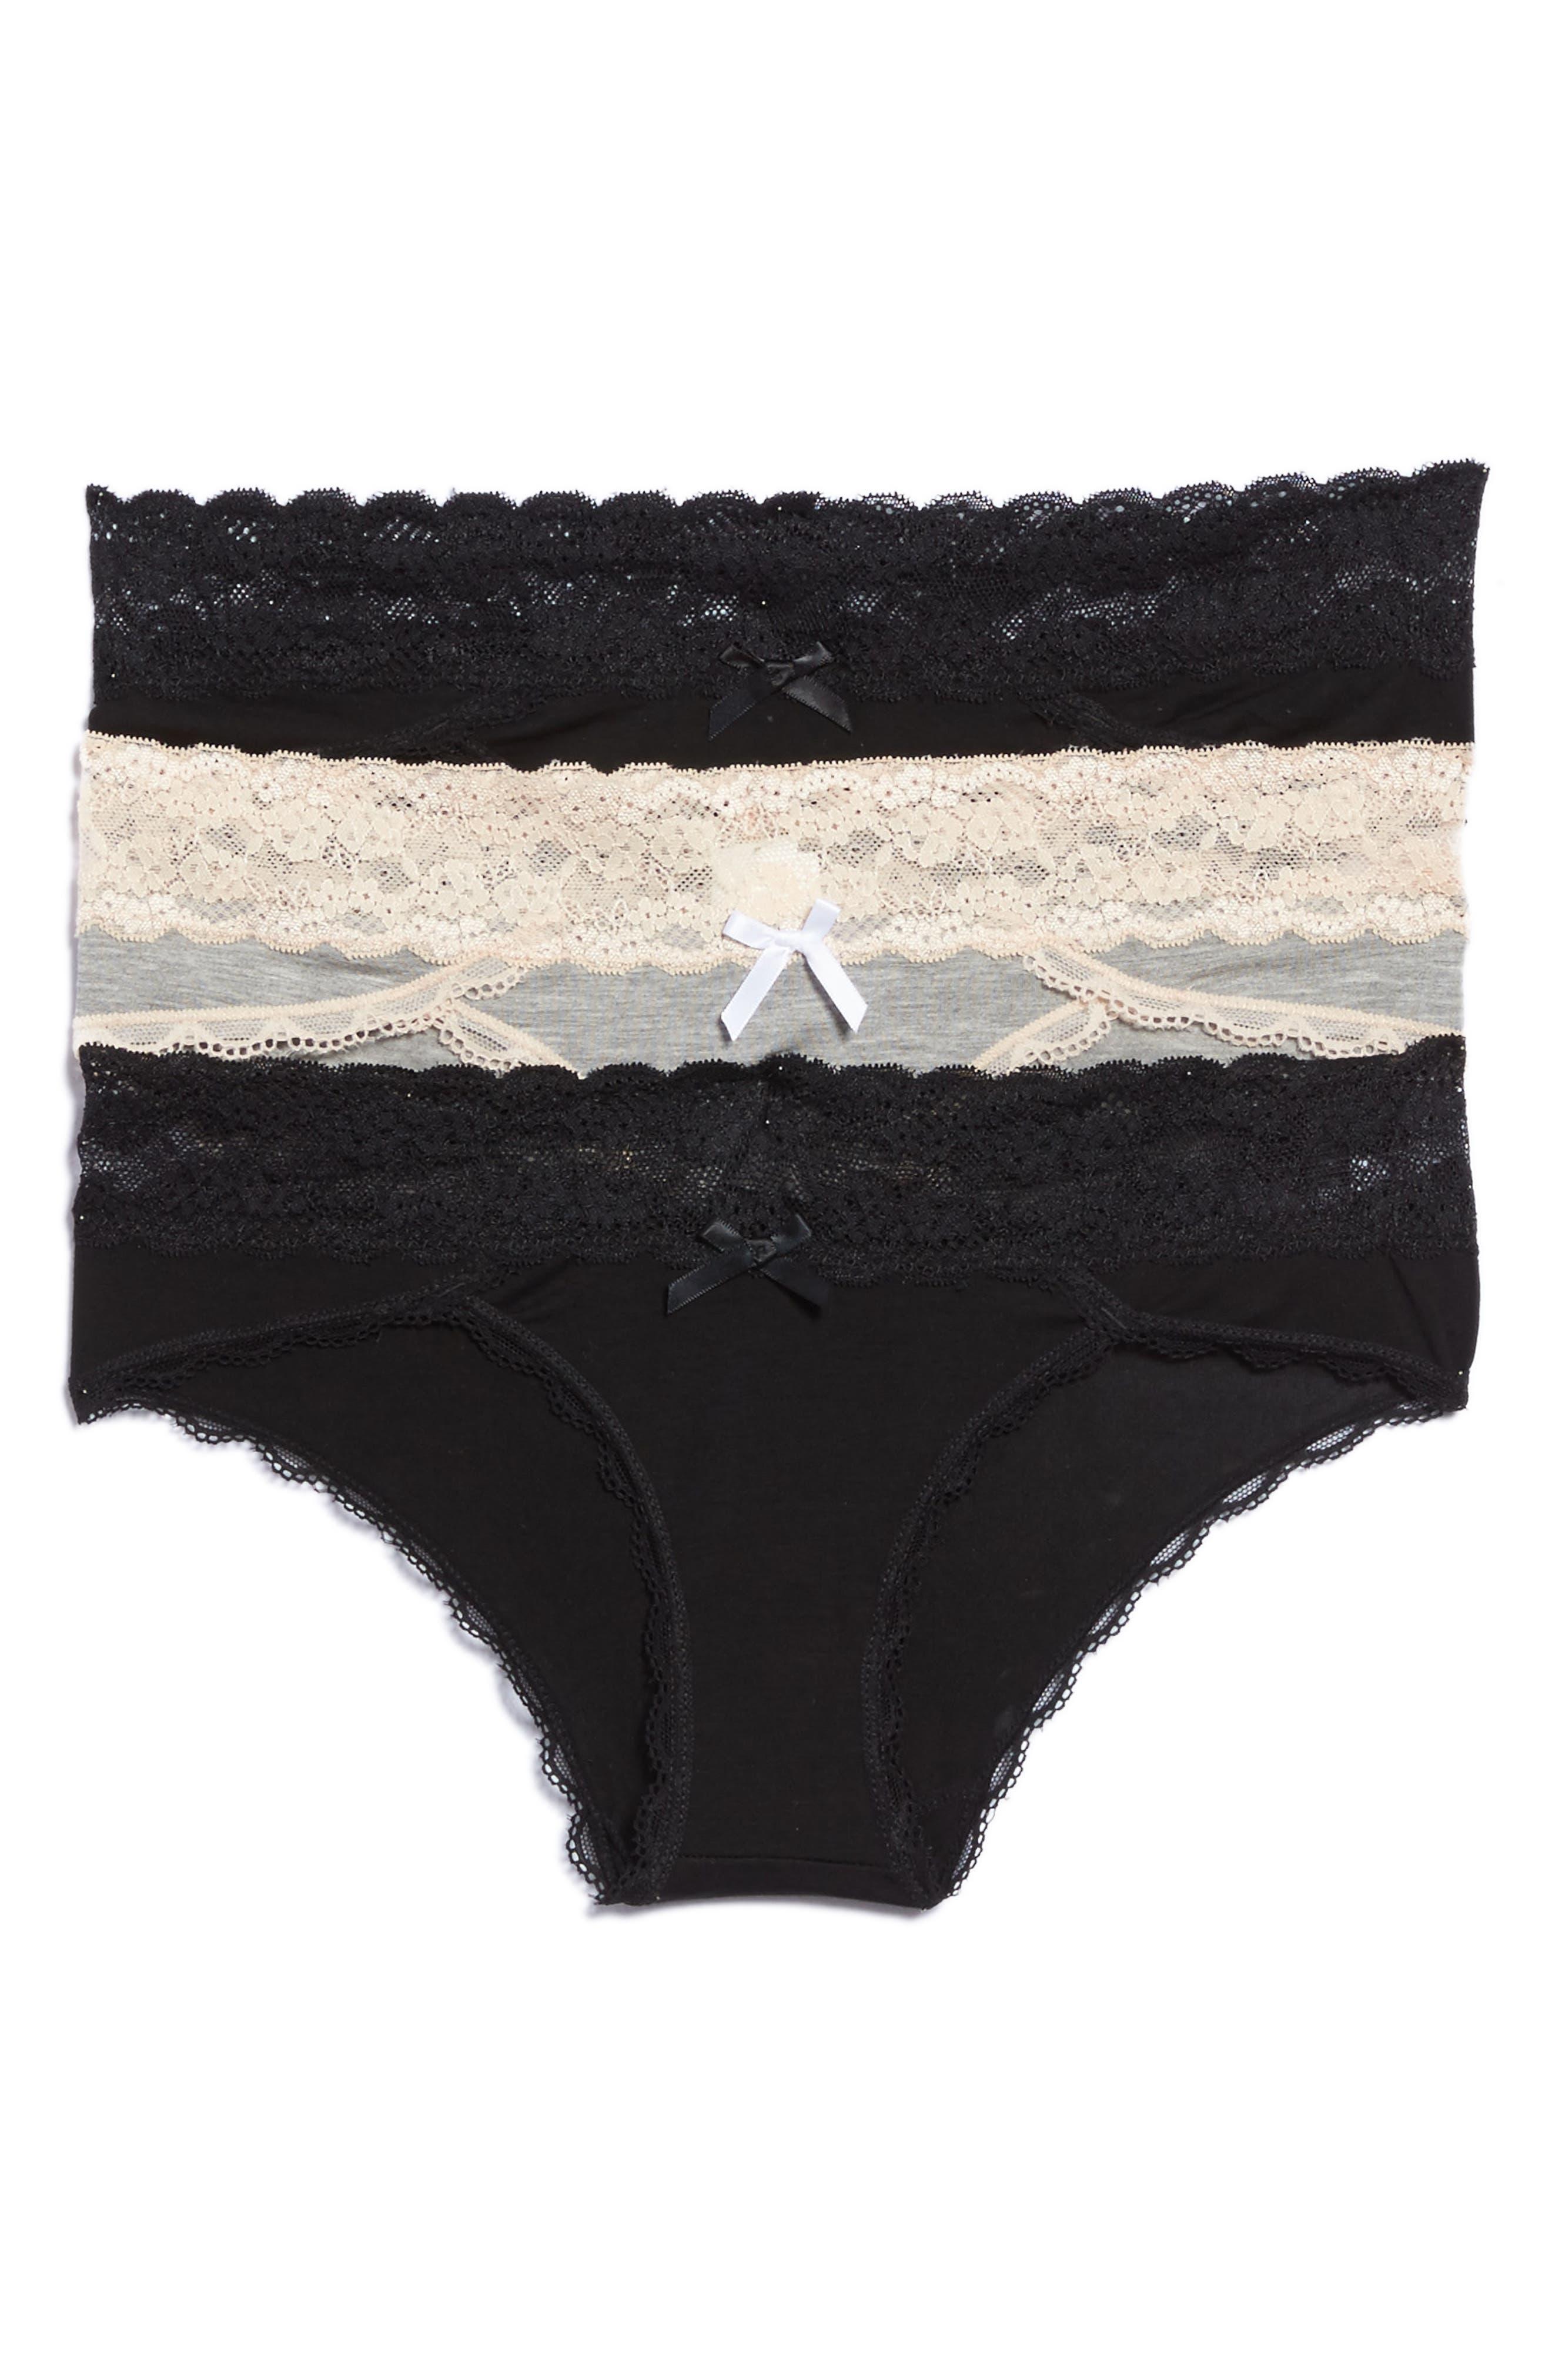 Alternate Image 1 Selected - Honeydew Intimates 3-Pack Hipster Panties